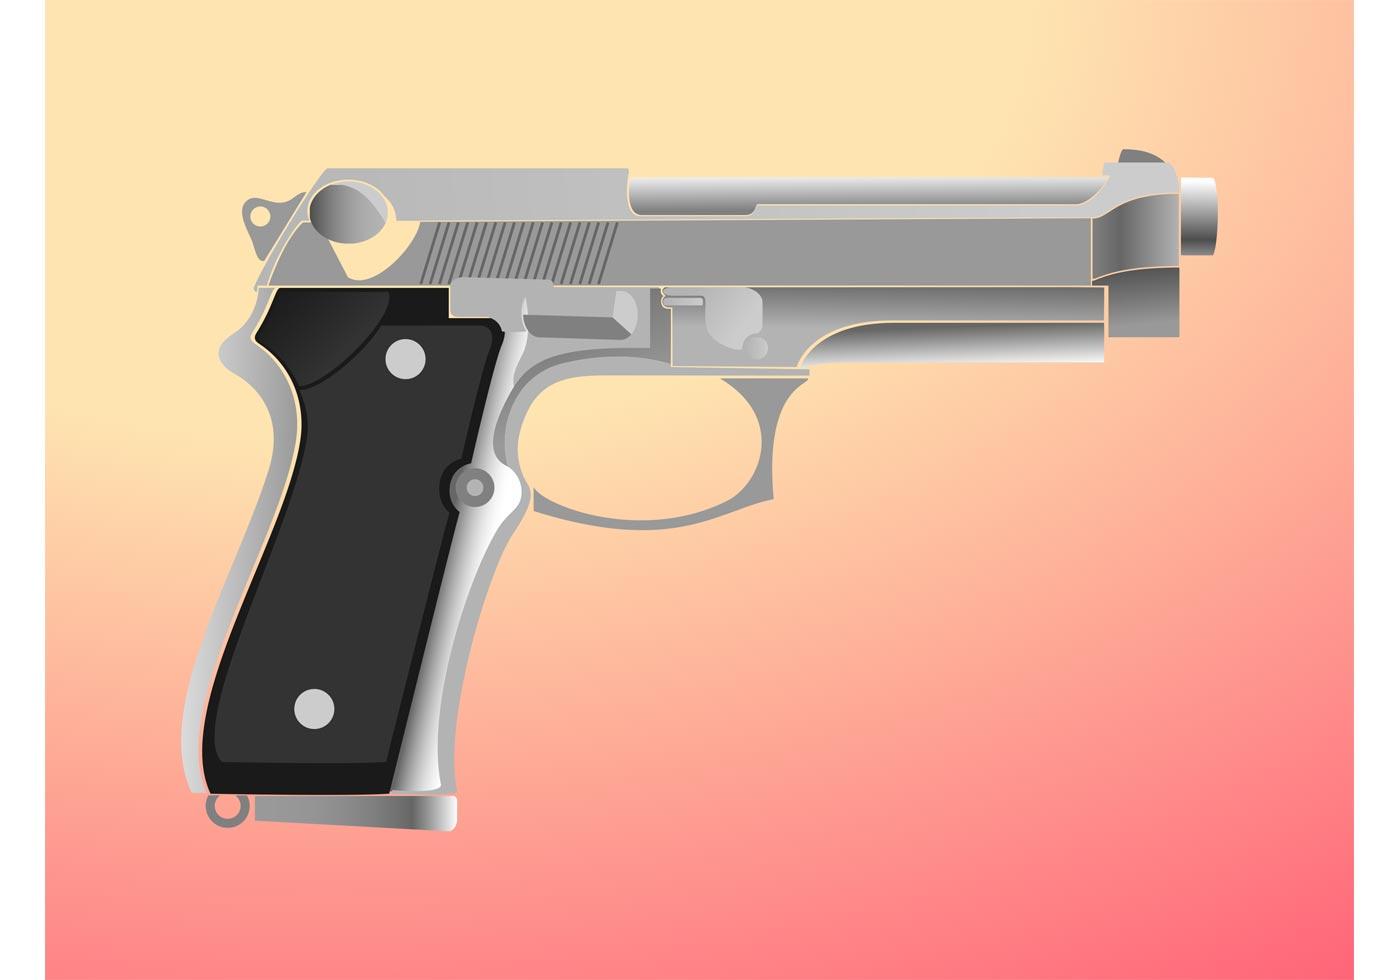 gun illustration download free vector art stock